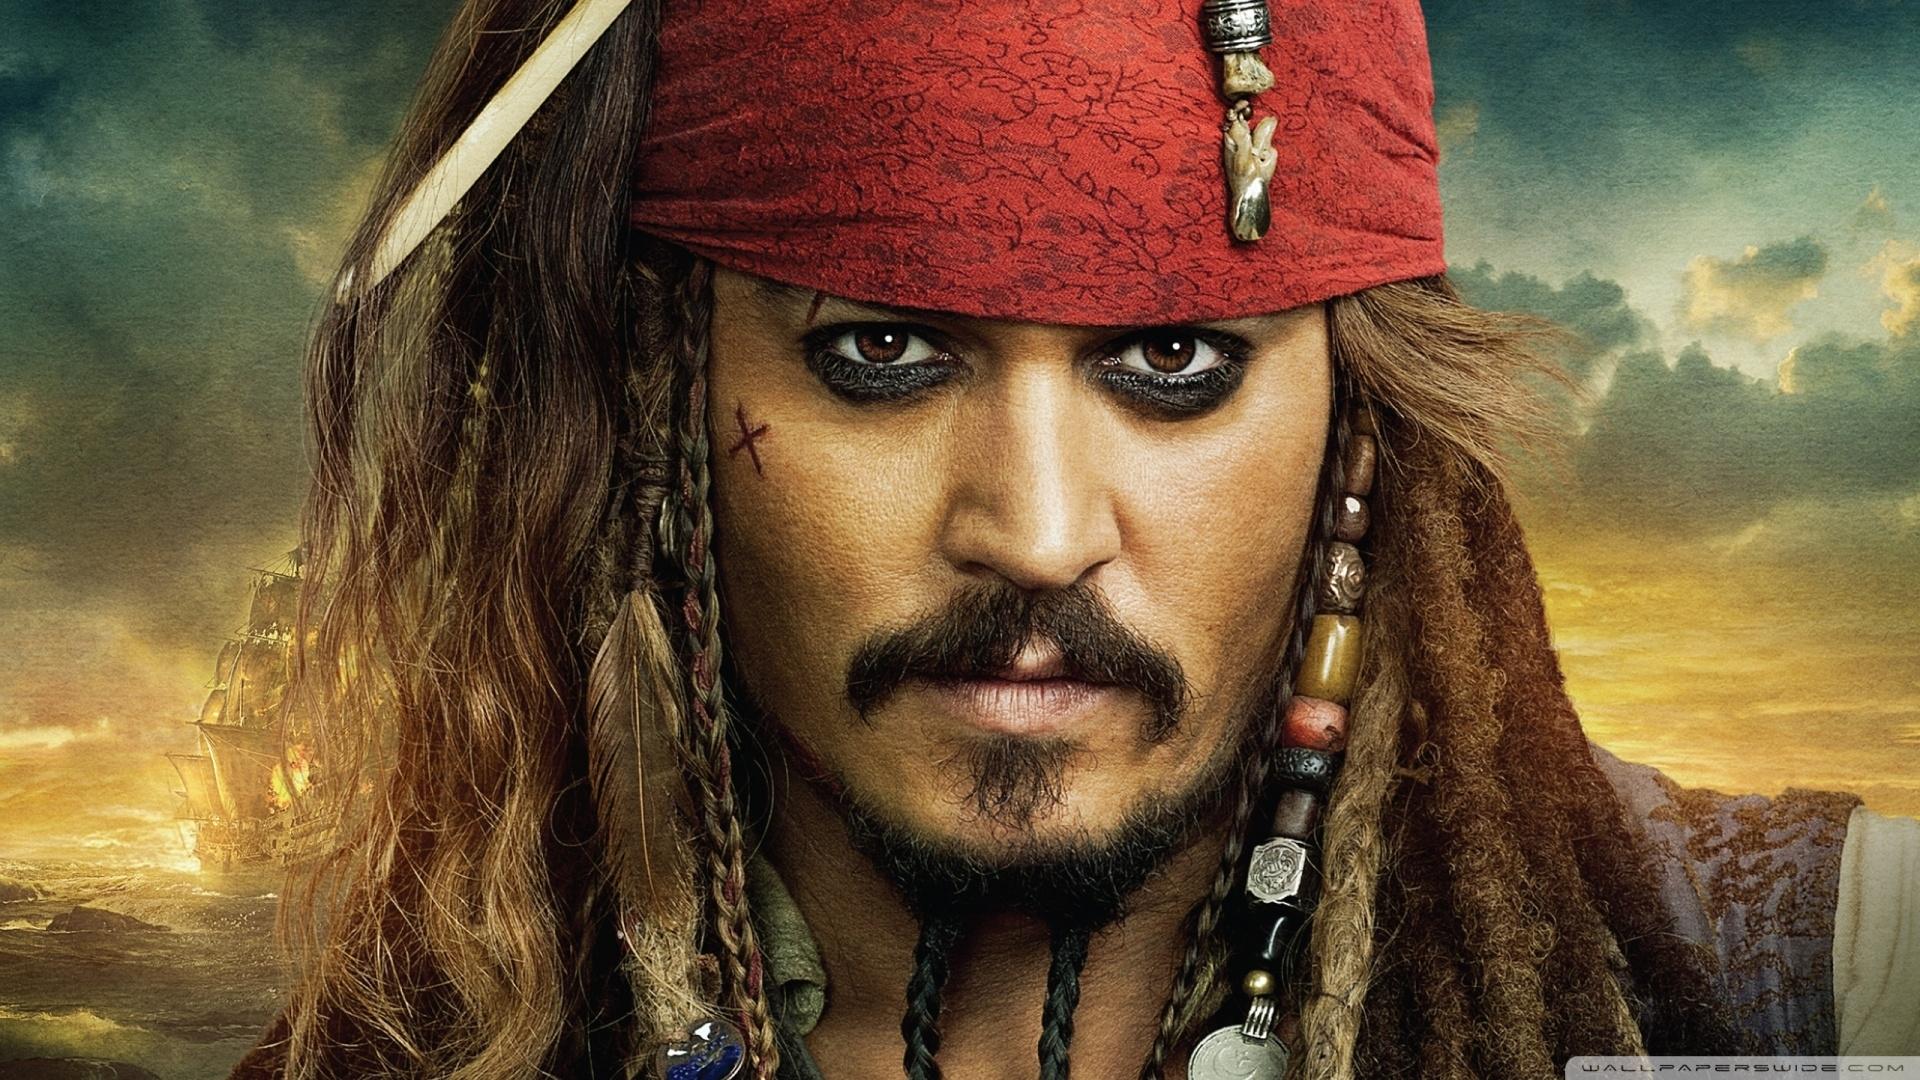 pirates of the caribbean on stranger tides - jack sparrow ❤ 4k hd